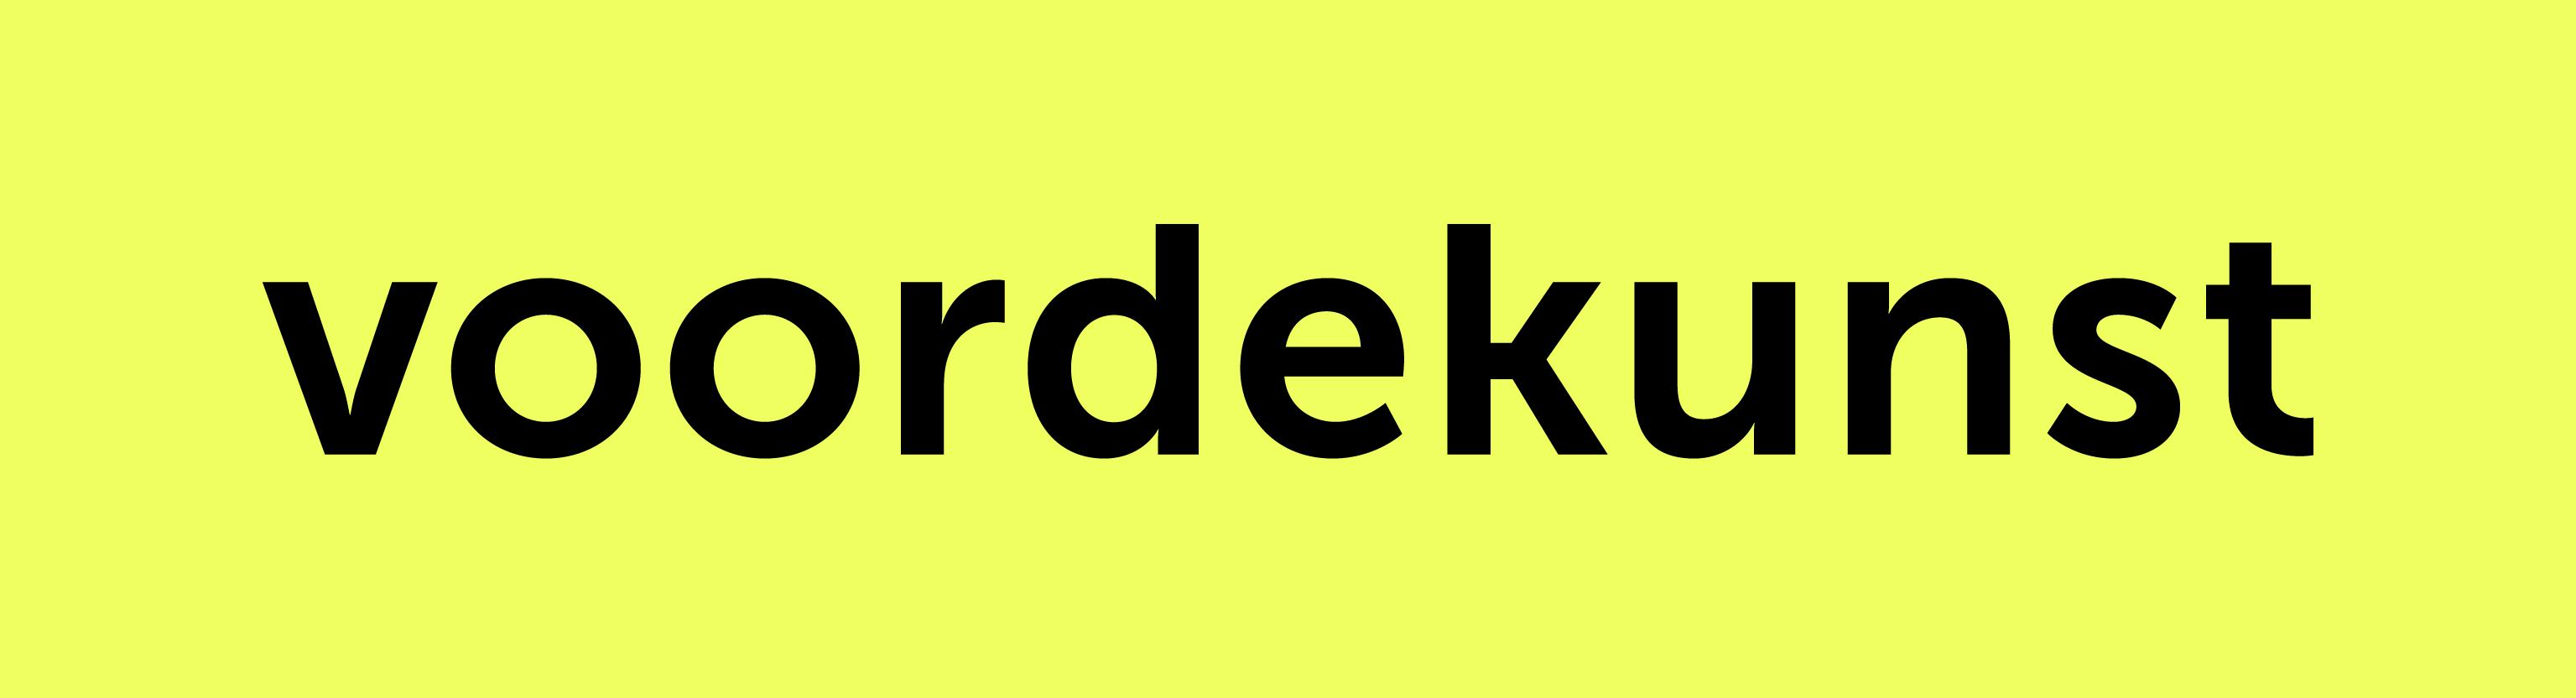 voordekunst logo